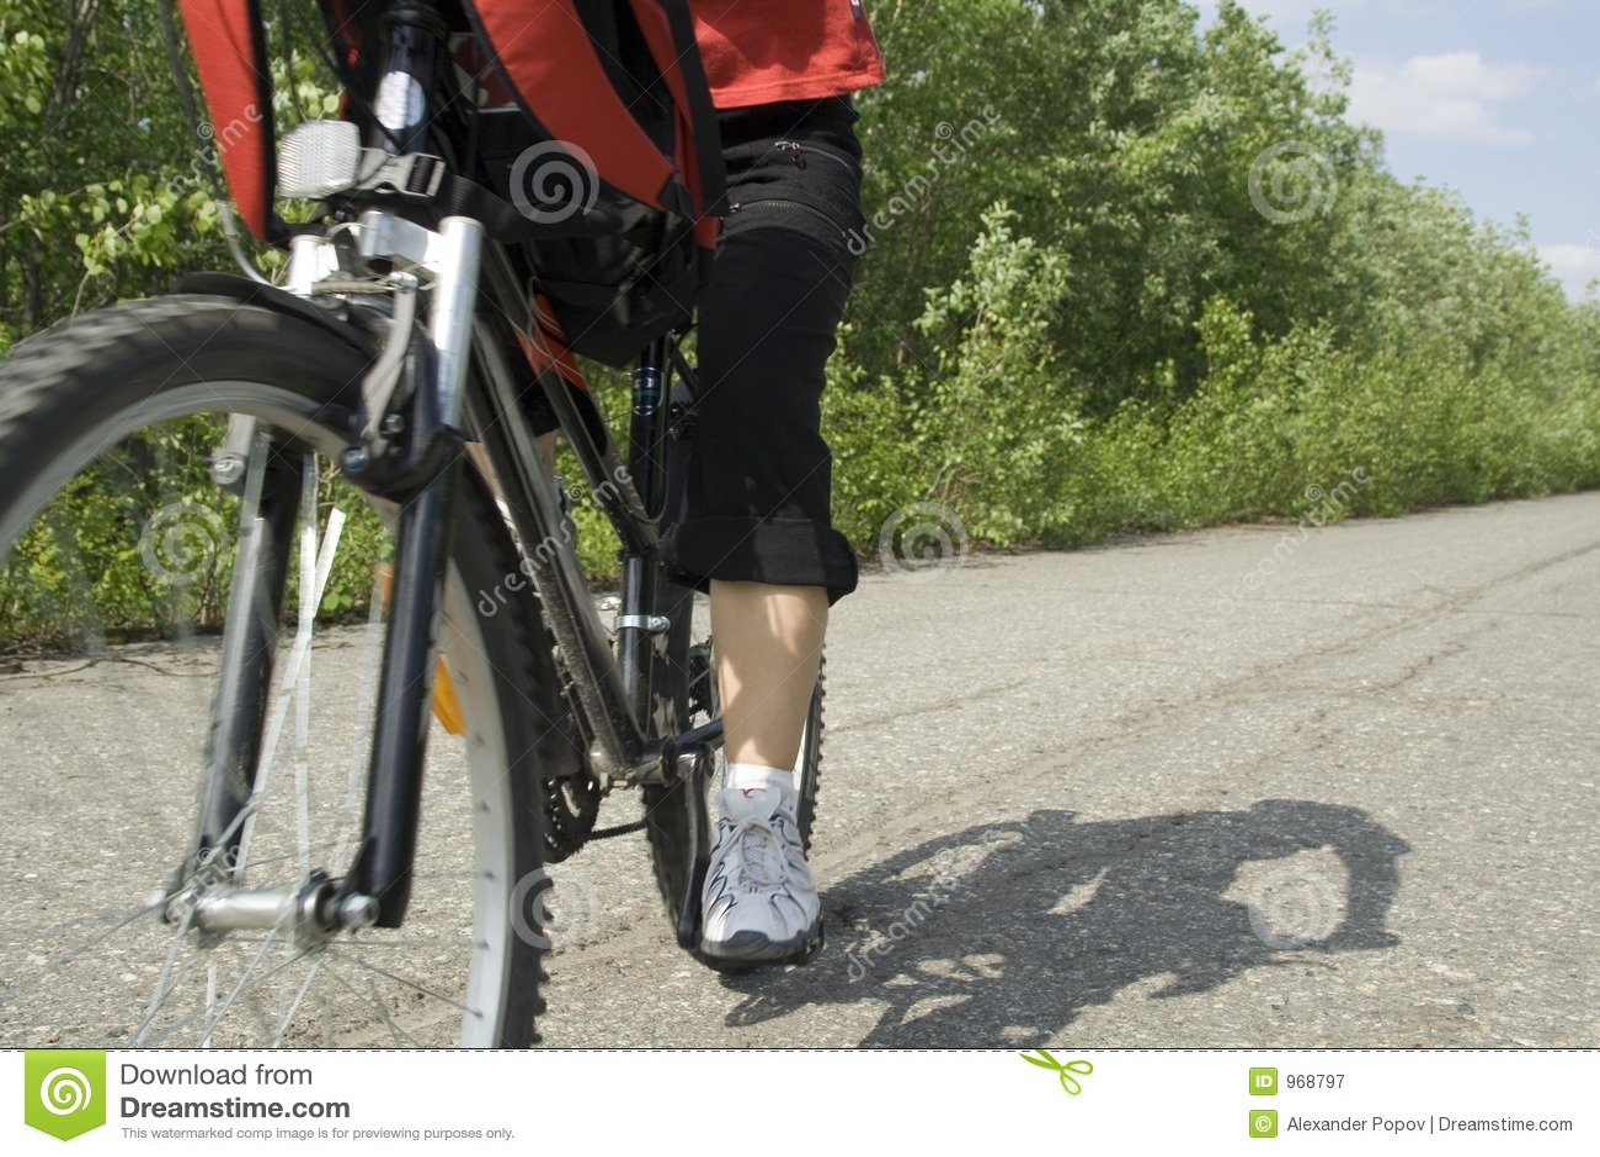 Bicycling_0021